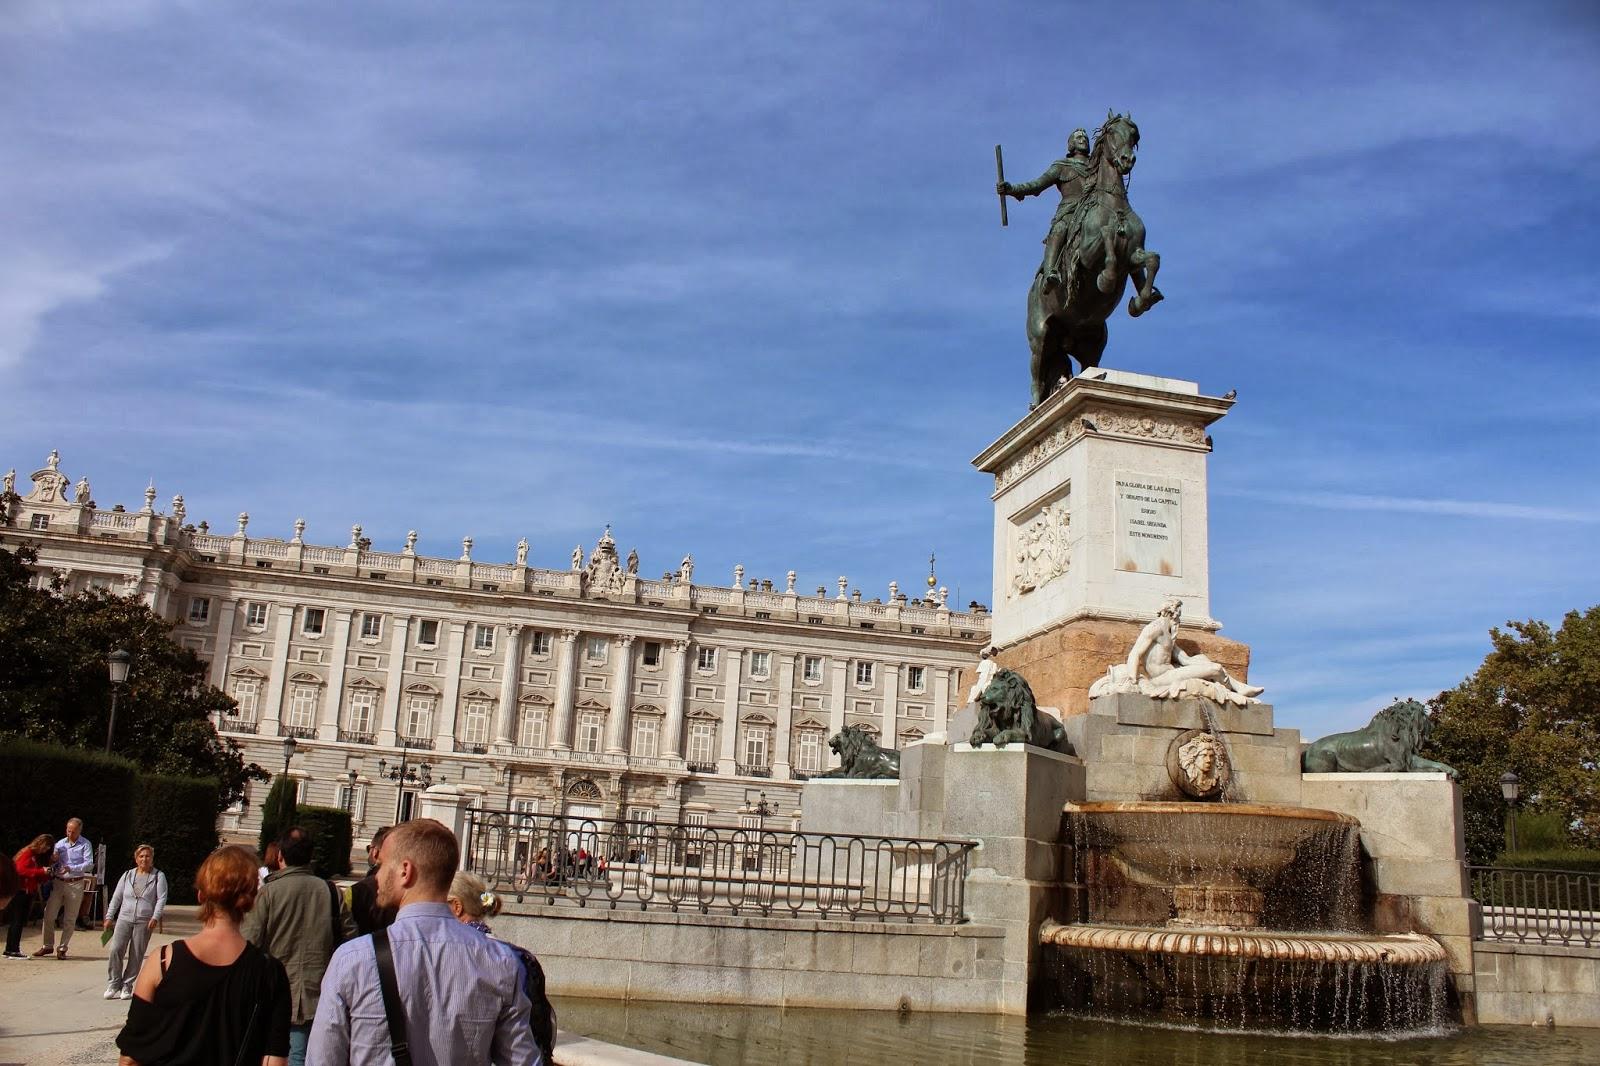 2013 Europe Backpacking Trip: Day 4: Madrid, Spain; 馬德里, 西班牙